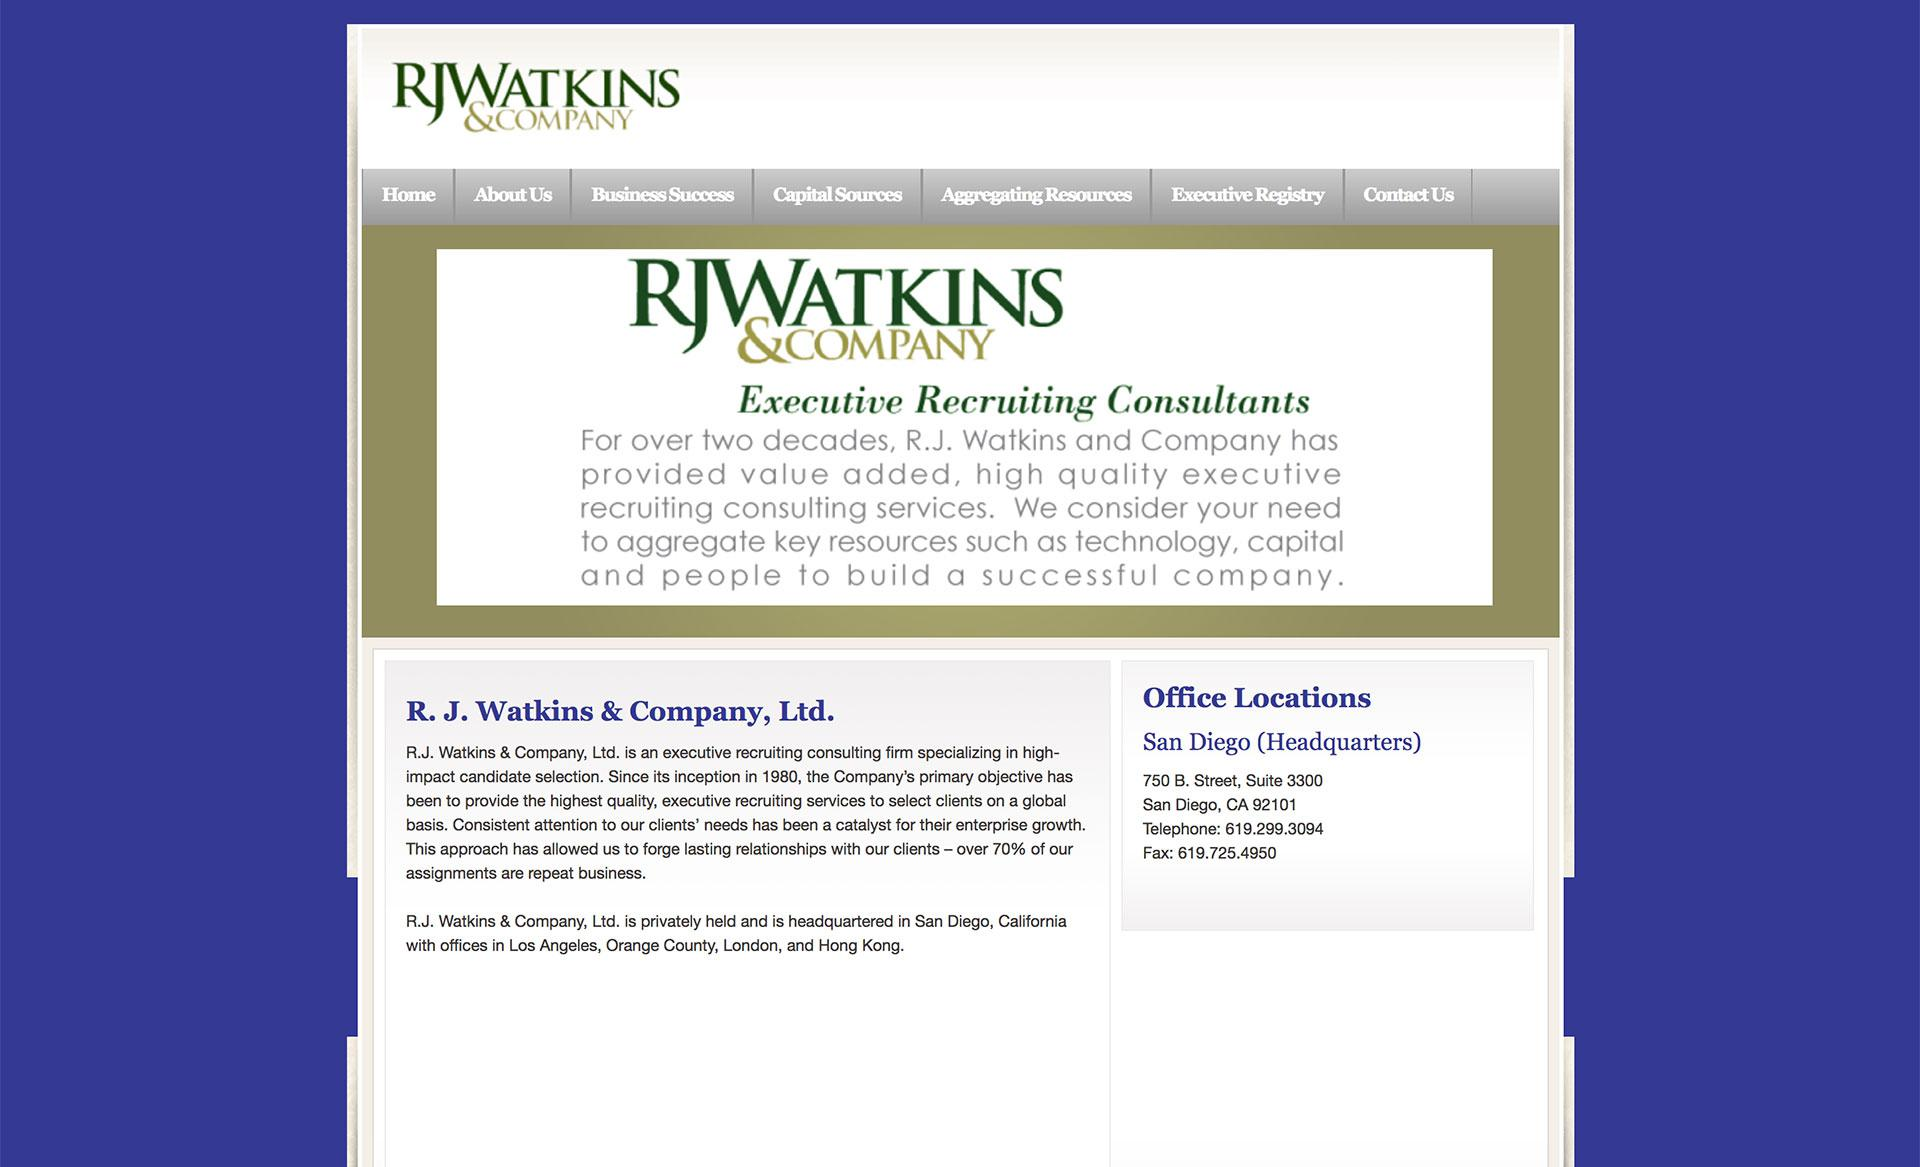 JR Watkins Company